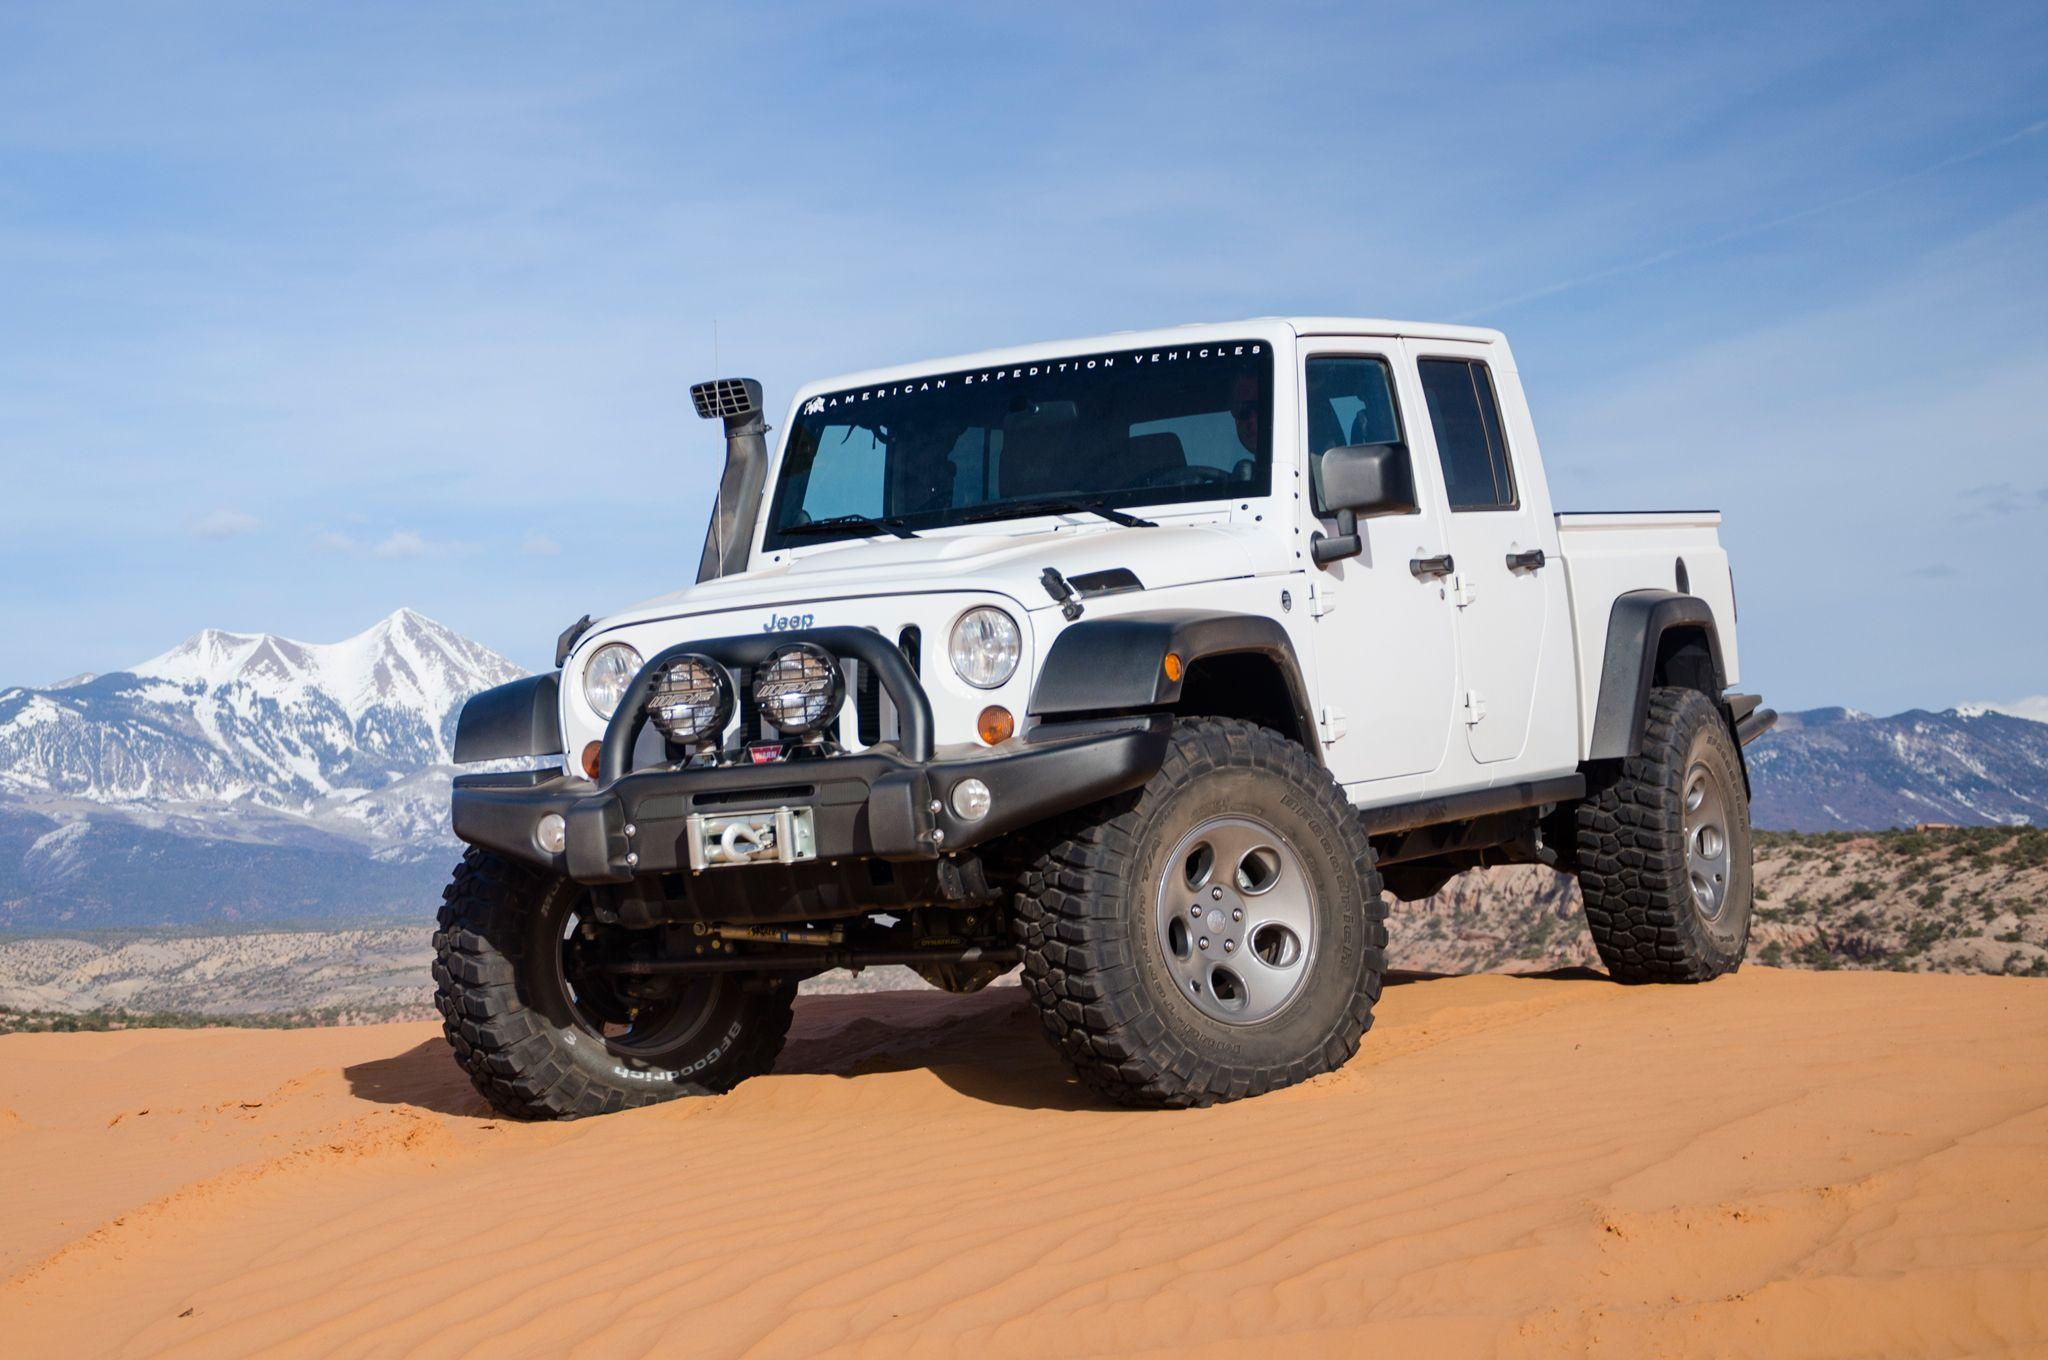 jeep wrangler jk aev brute double cab left front sand 2048—1360